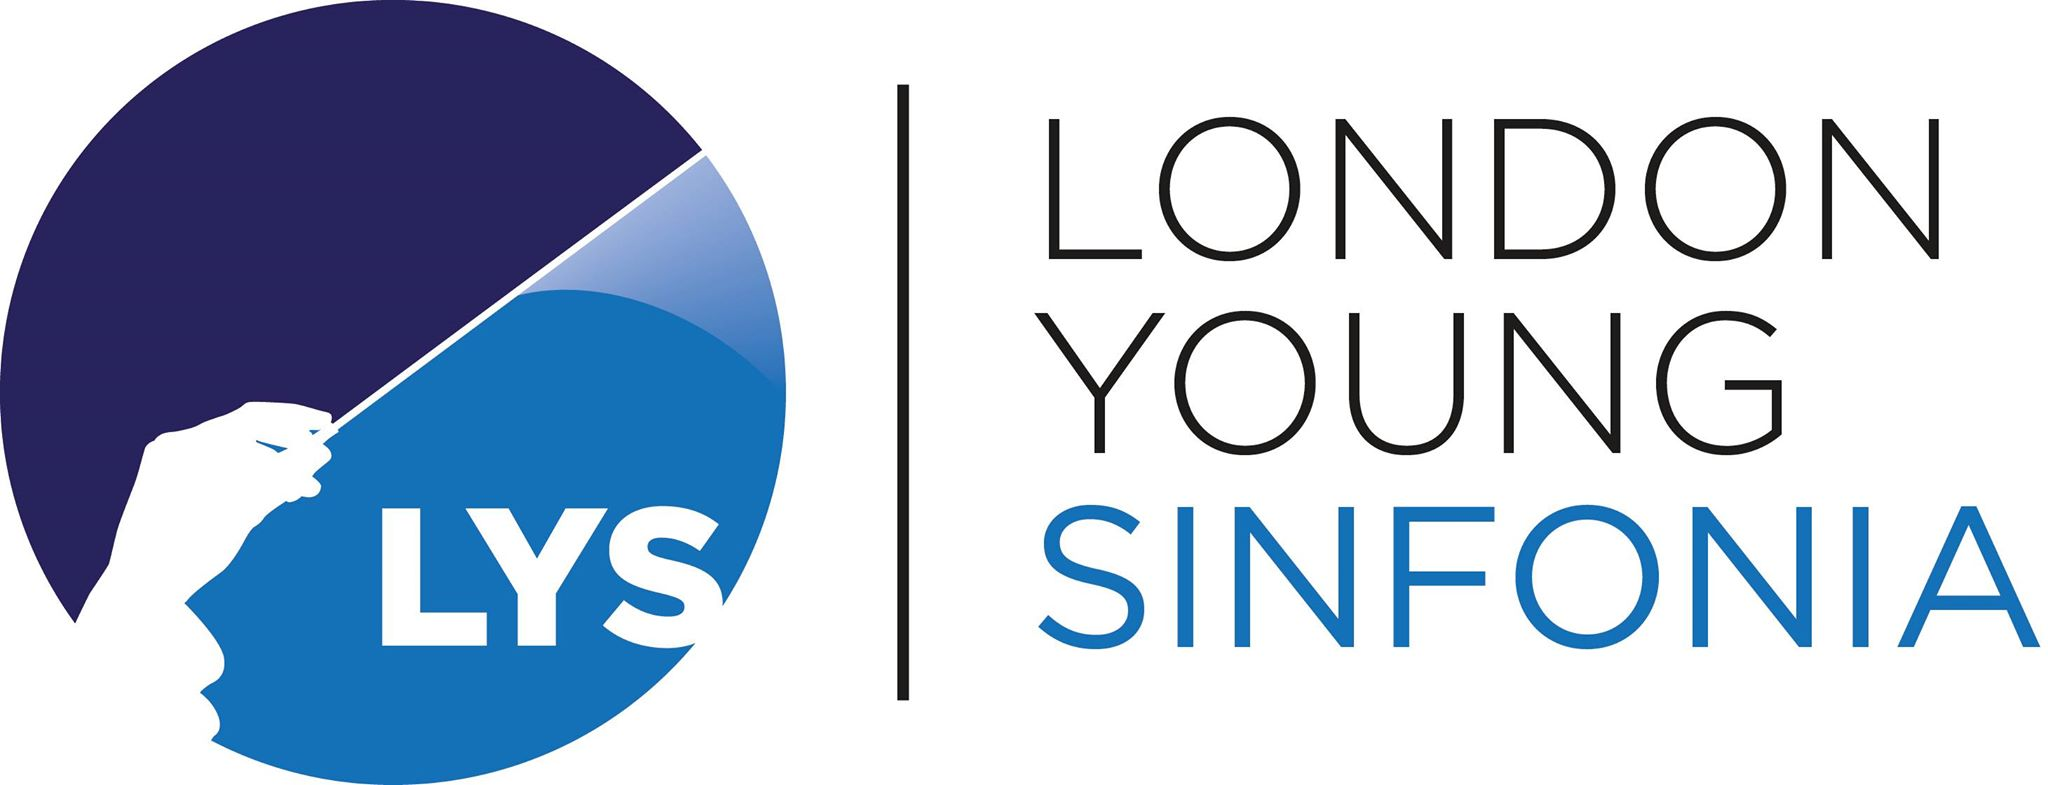 1.6.19   London Young Sinfonia